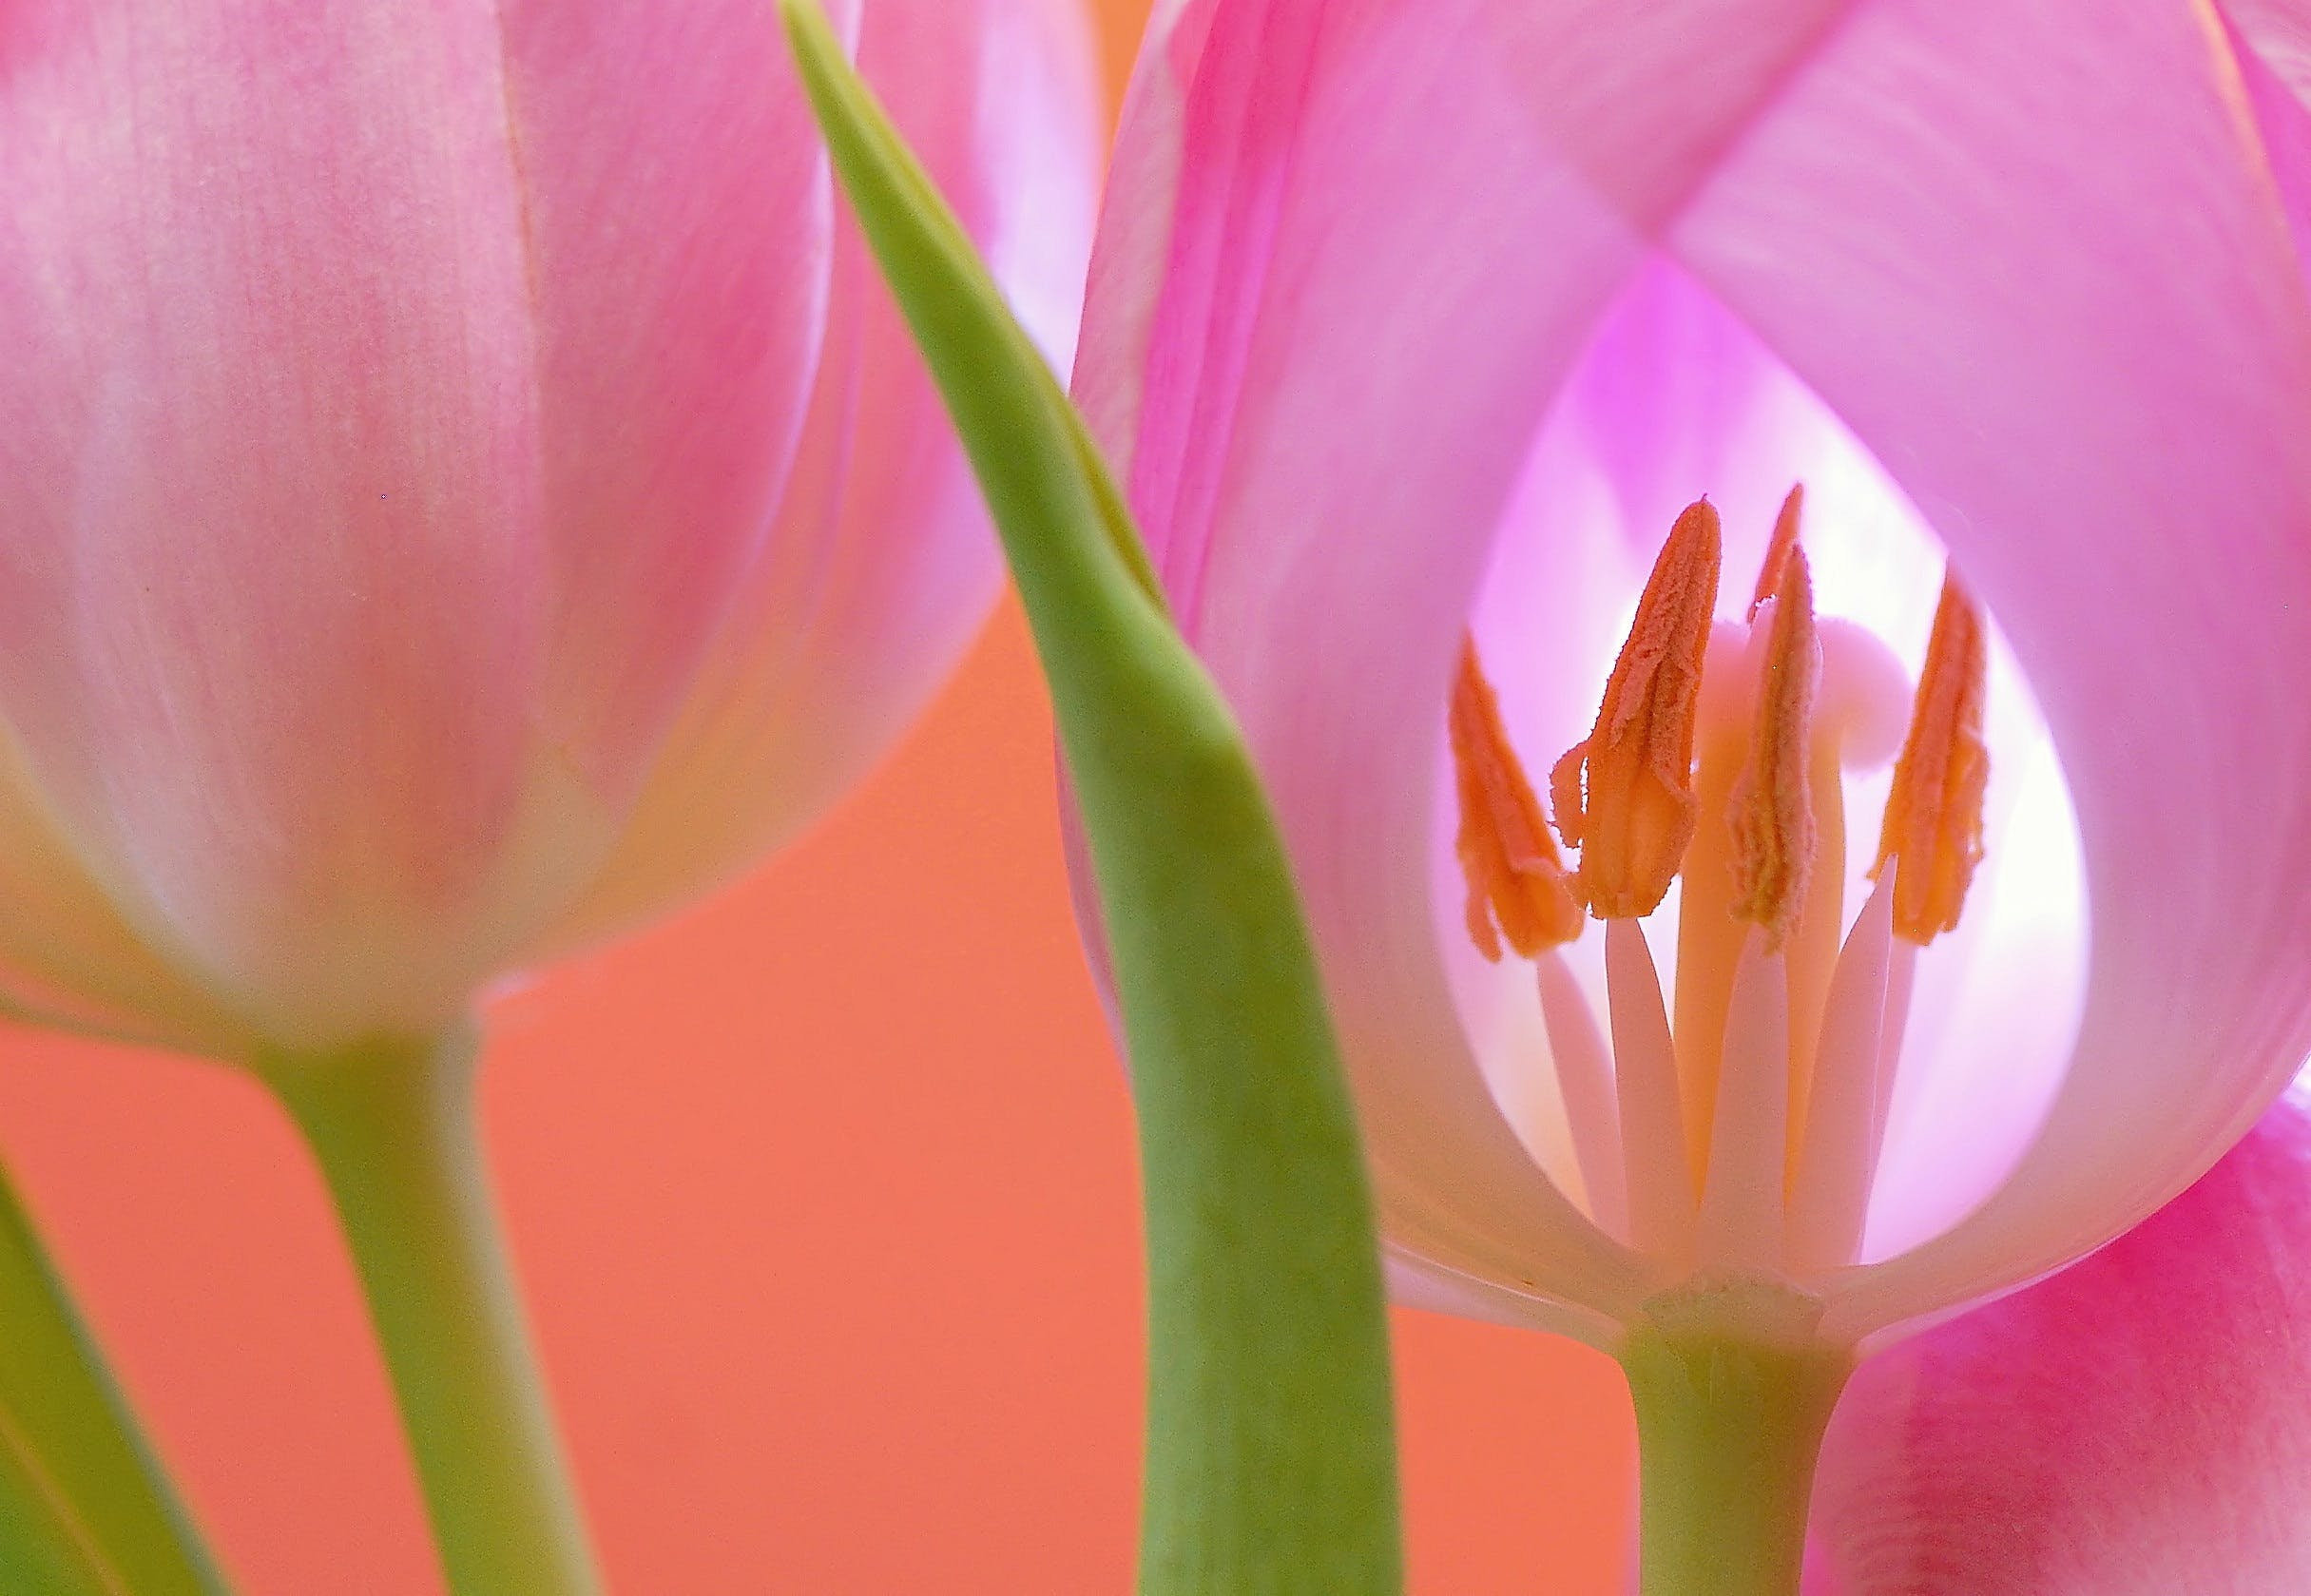 Free stock photo of nature, summer, garden, petals